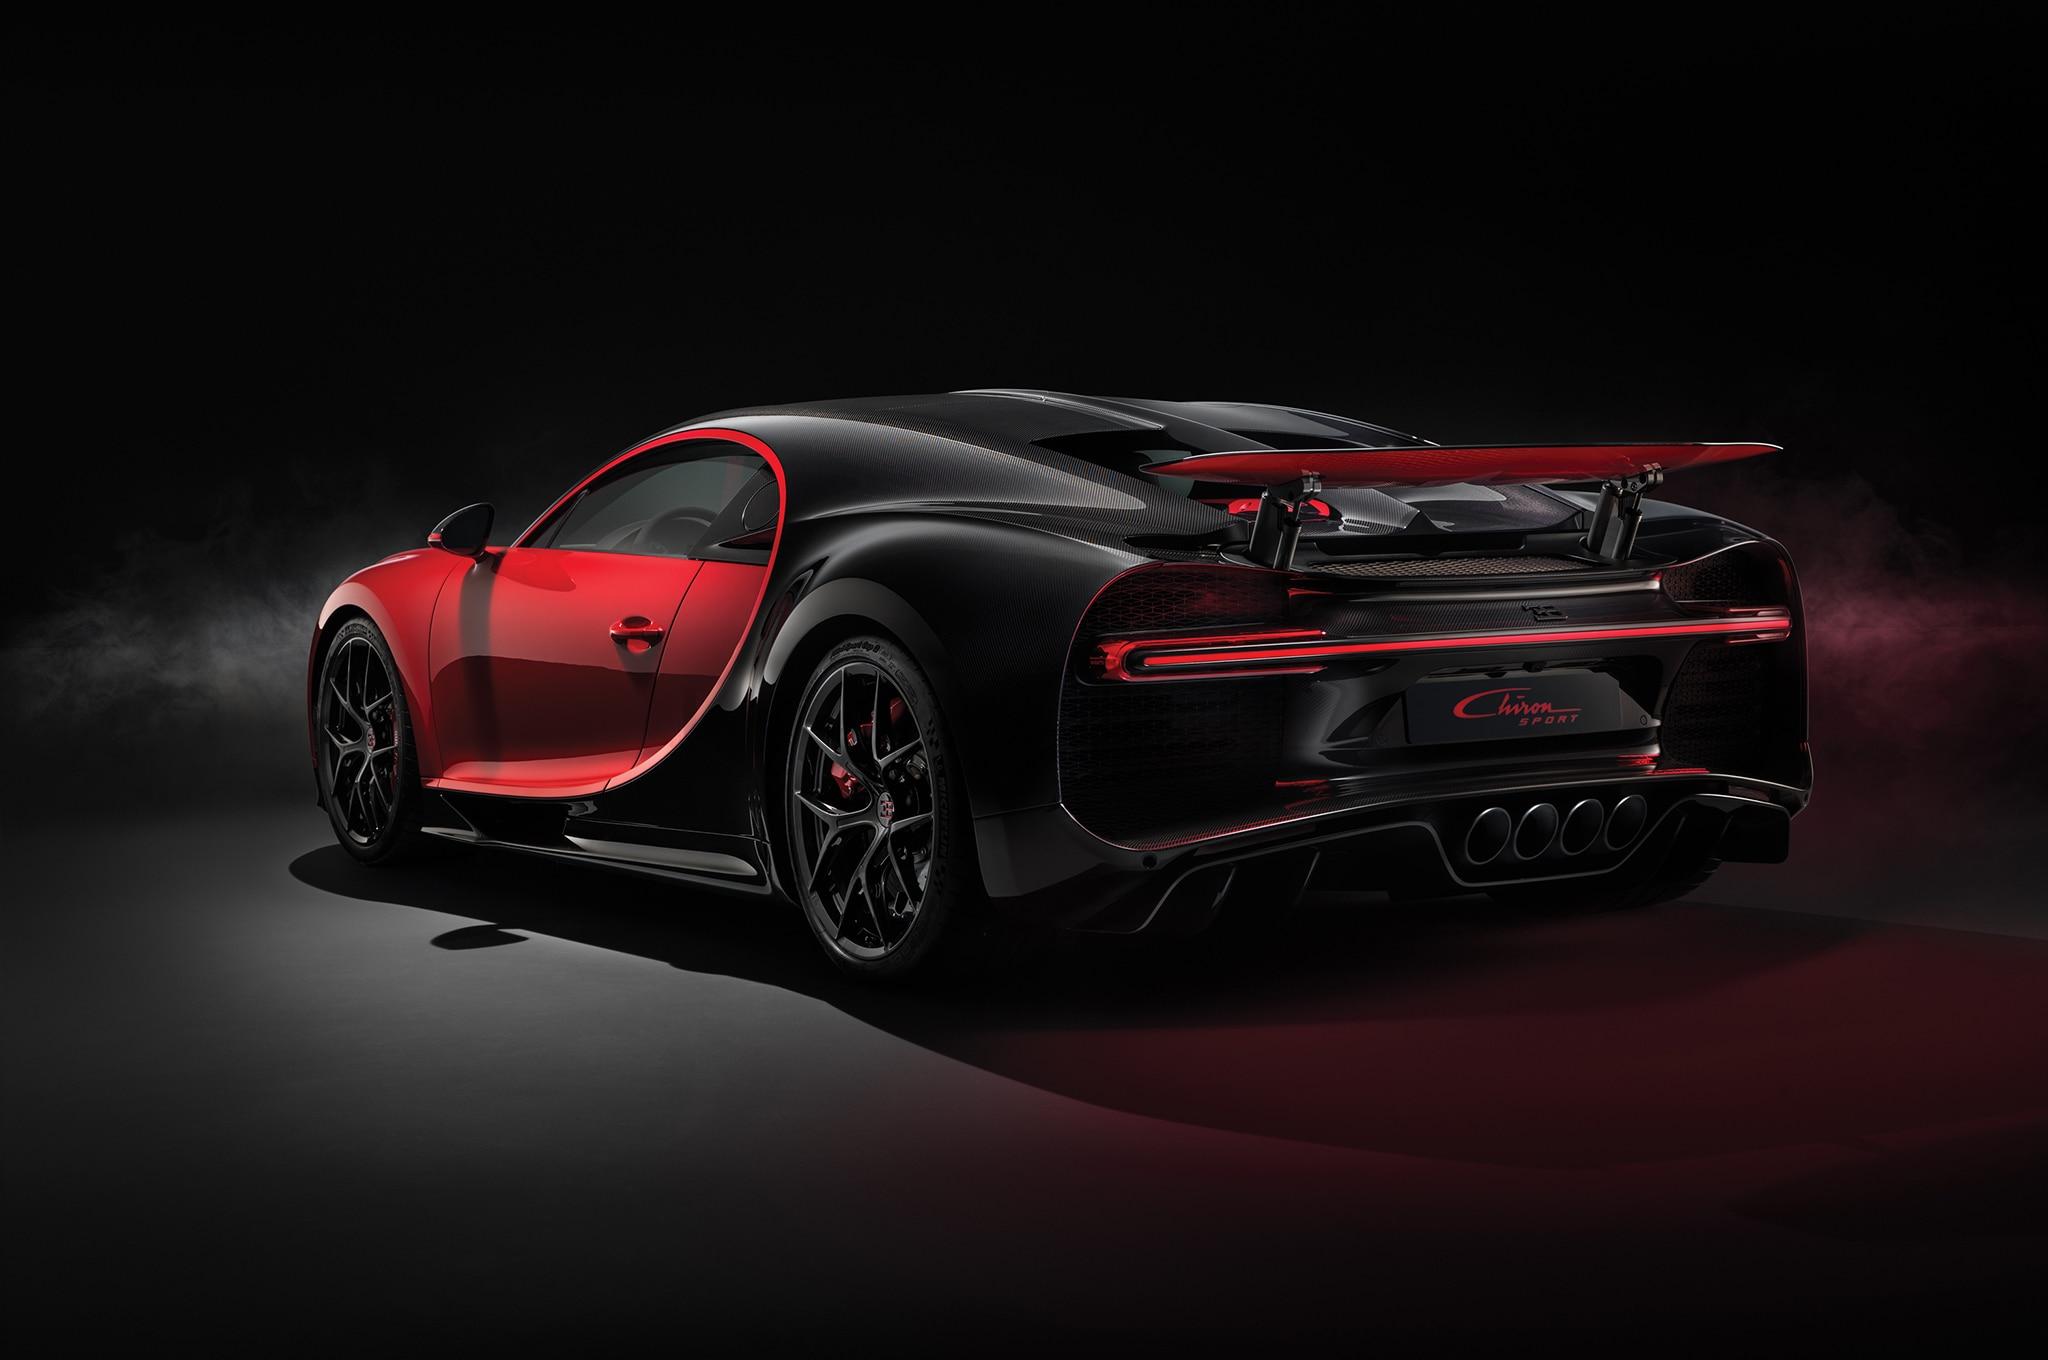 Bugatti at the Geneva Motor Show 2018